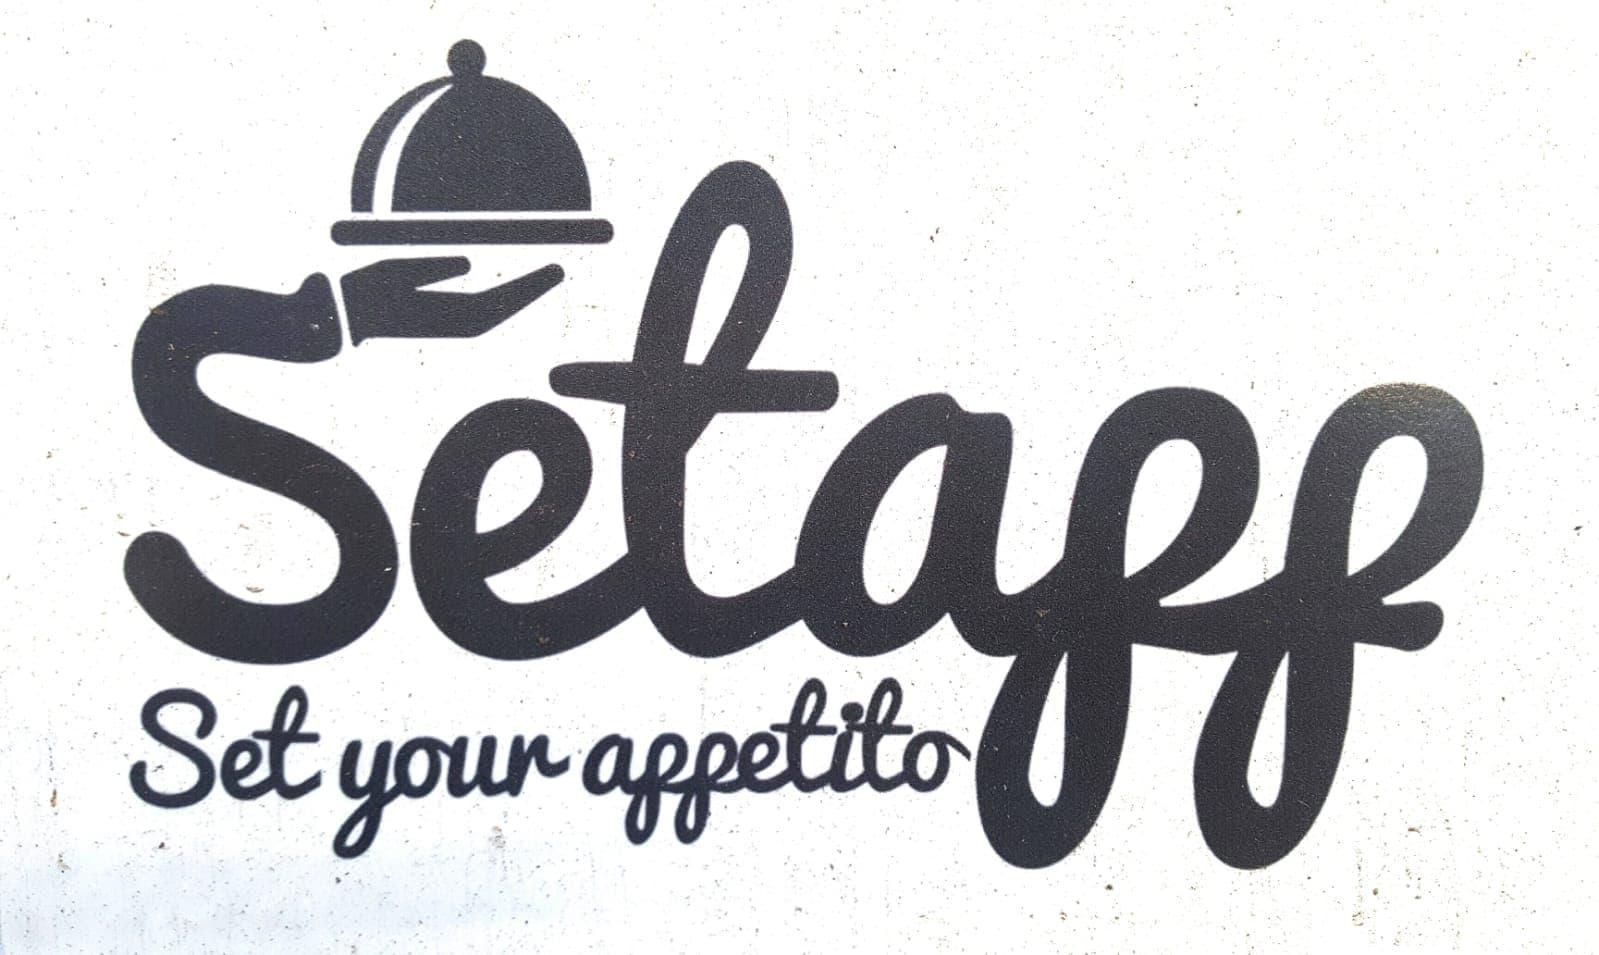 logo setapp